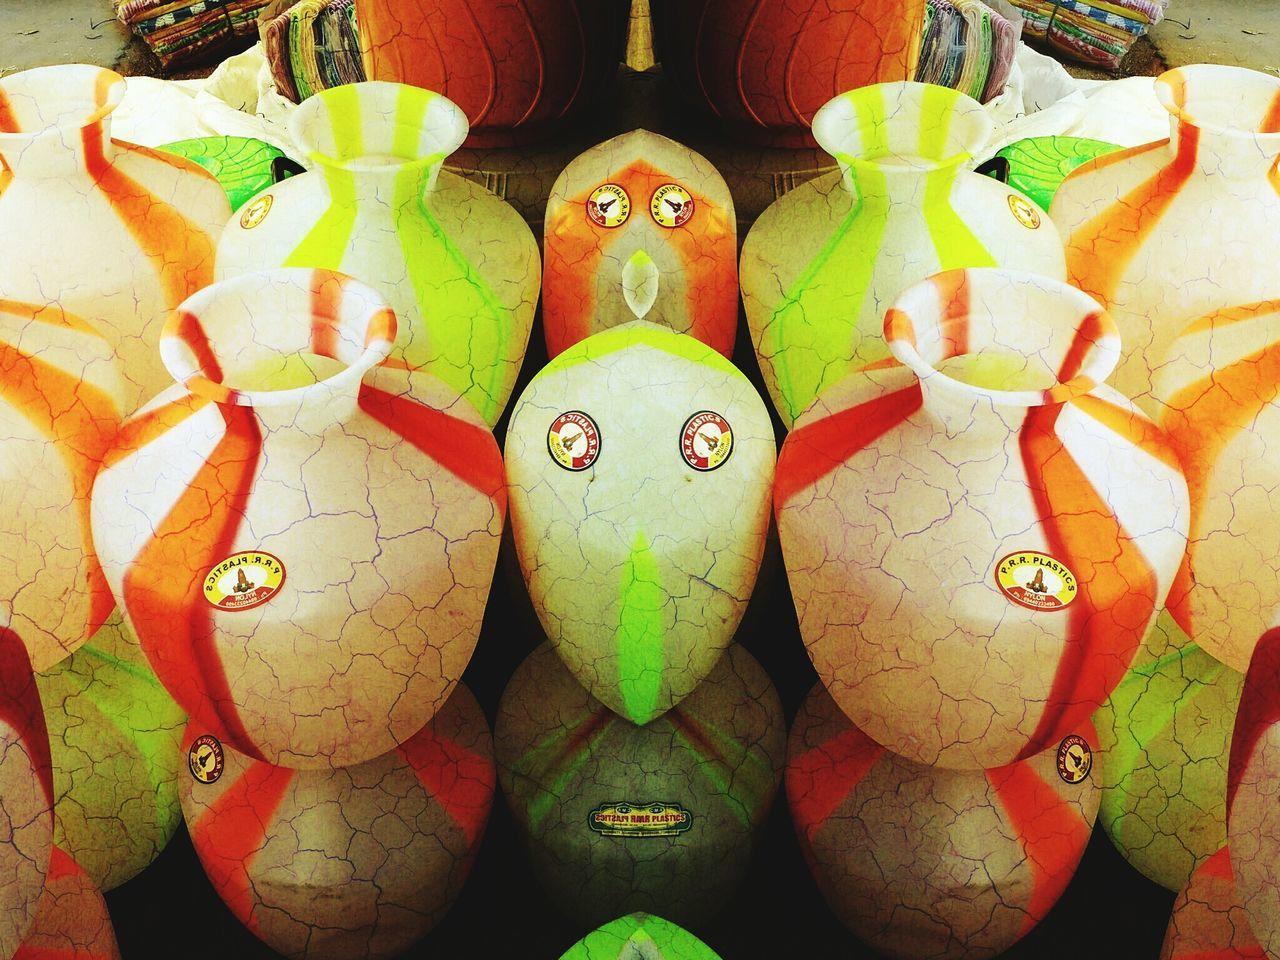 Large Group Of Objects No People Close-up Indoors  Day Eyem Best Shots Eyeemphotography EyeEm Best Edits Eyeem Market Outdoors Artistic Freedom Editing For Fun Edit Photo Artisticphoto ObjectPhotography Objects Objects And Subjects Expressive Expressionism Expressive Sculpture Expressions Funny Pics Random Edit